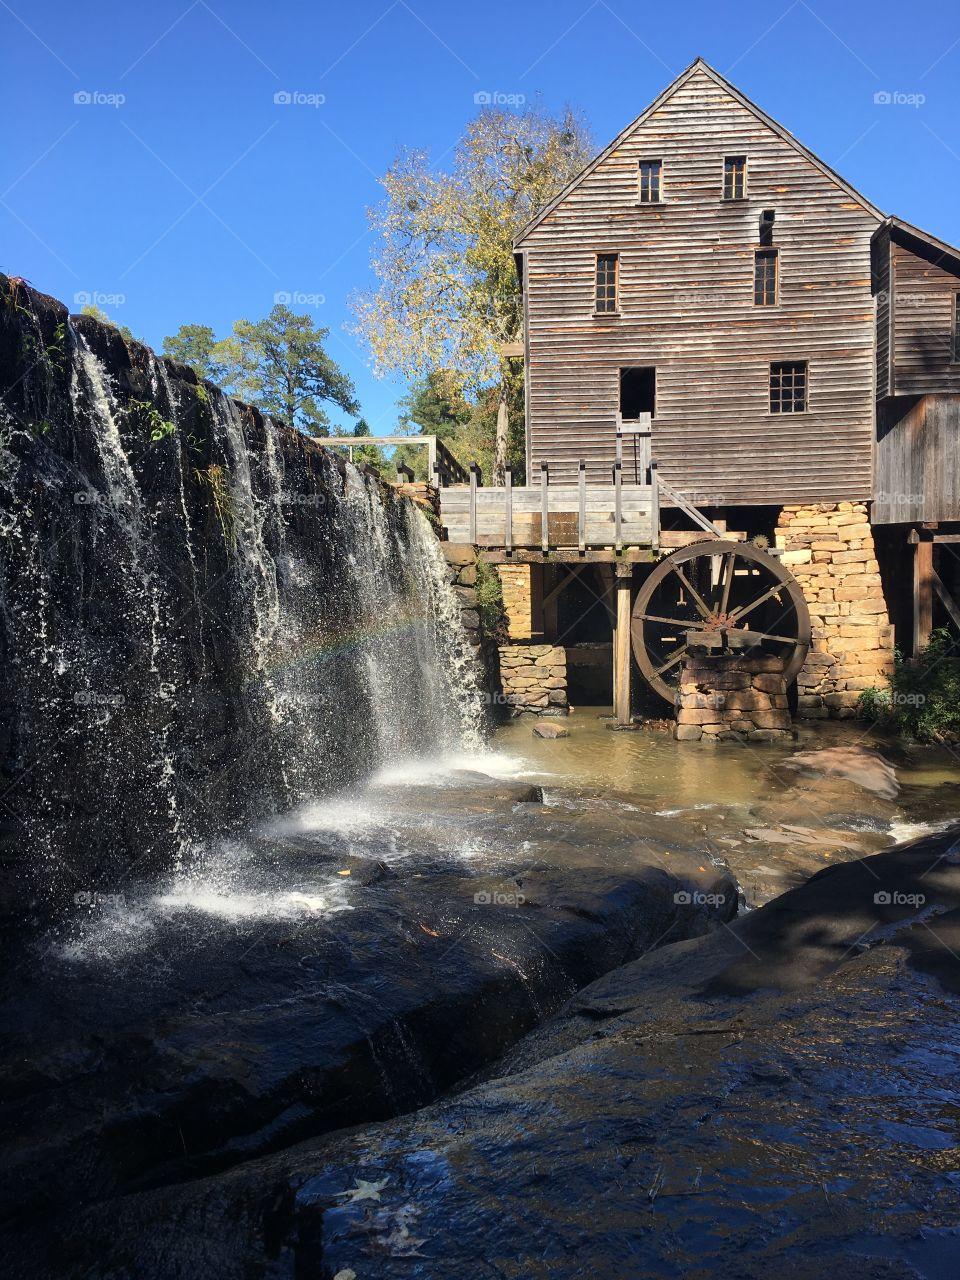 Historic Yates Mill in Raleigh North Carolina